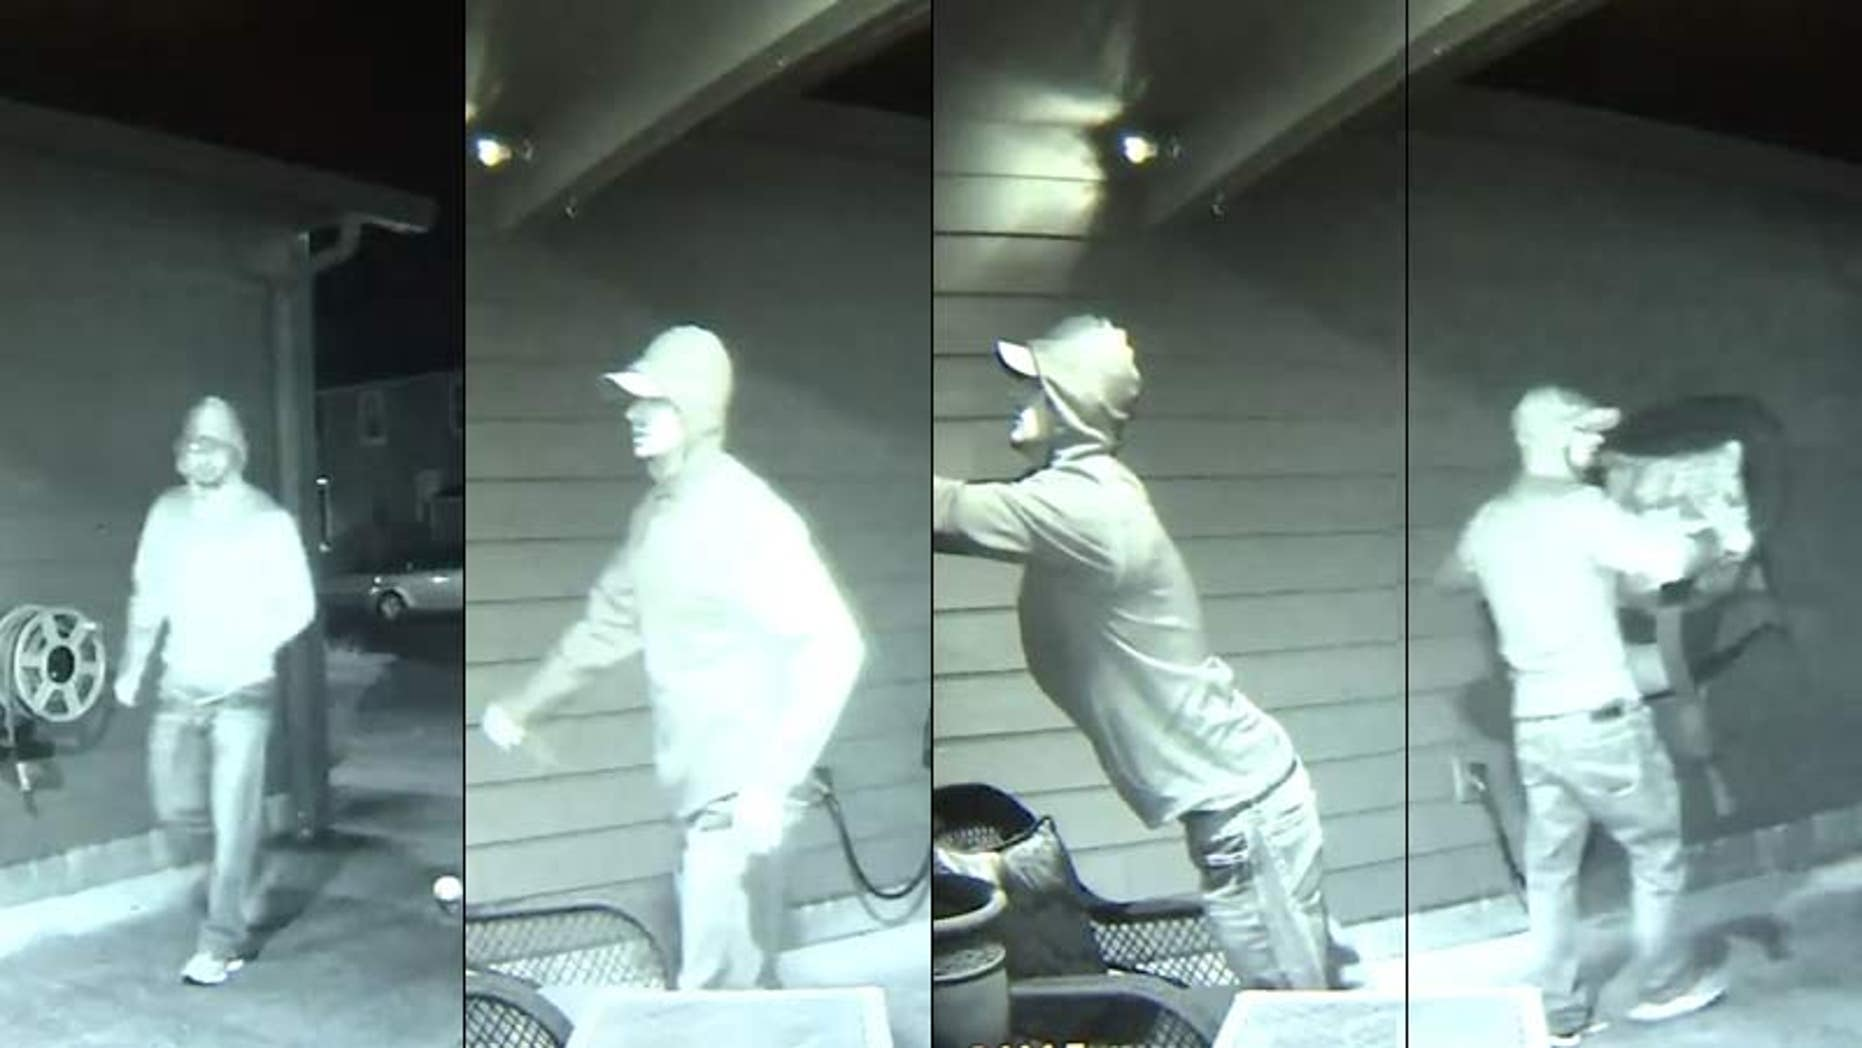 Surveillance images of Salem burglary suspect.